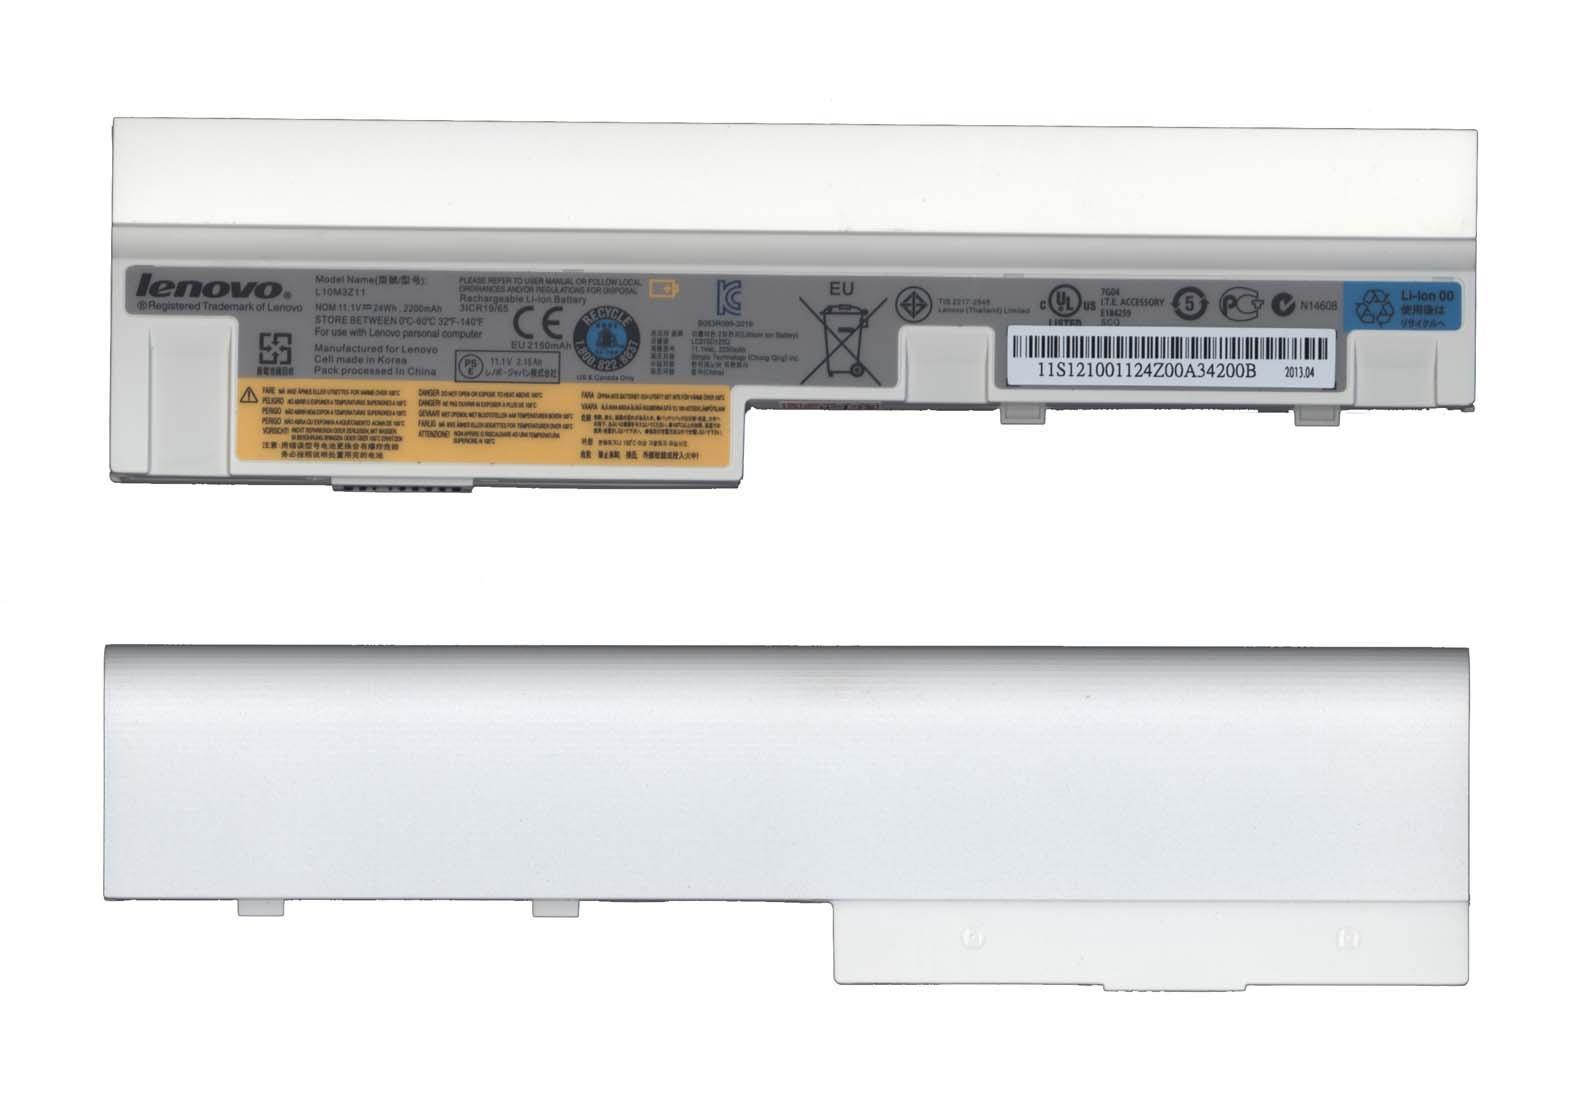 Аккумулятор для ноутбука IBM-Lenovo S10-3, S100, U160 белый